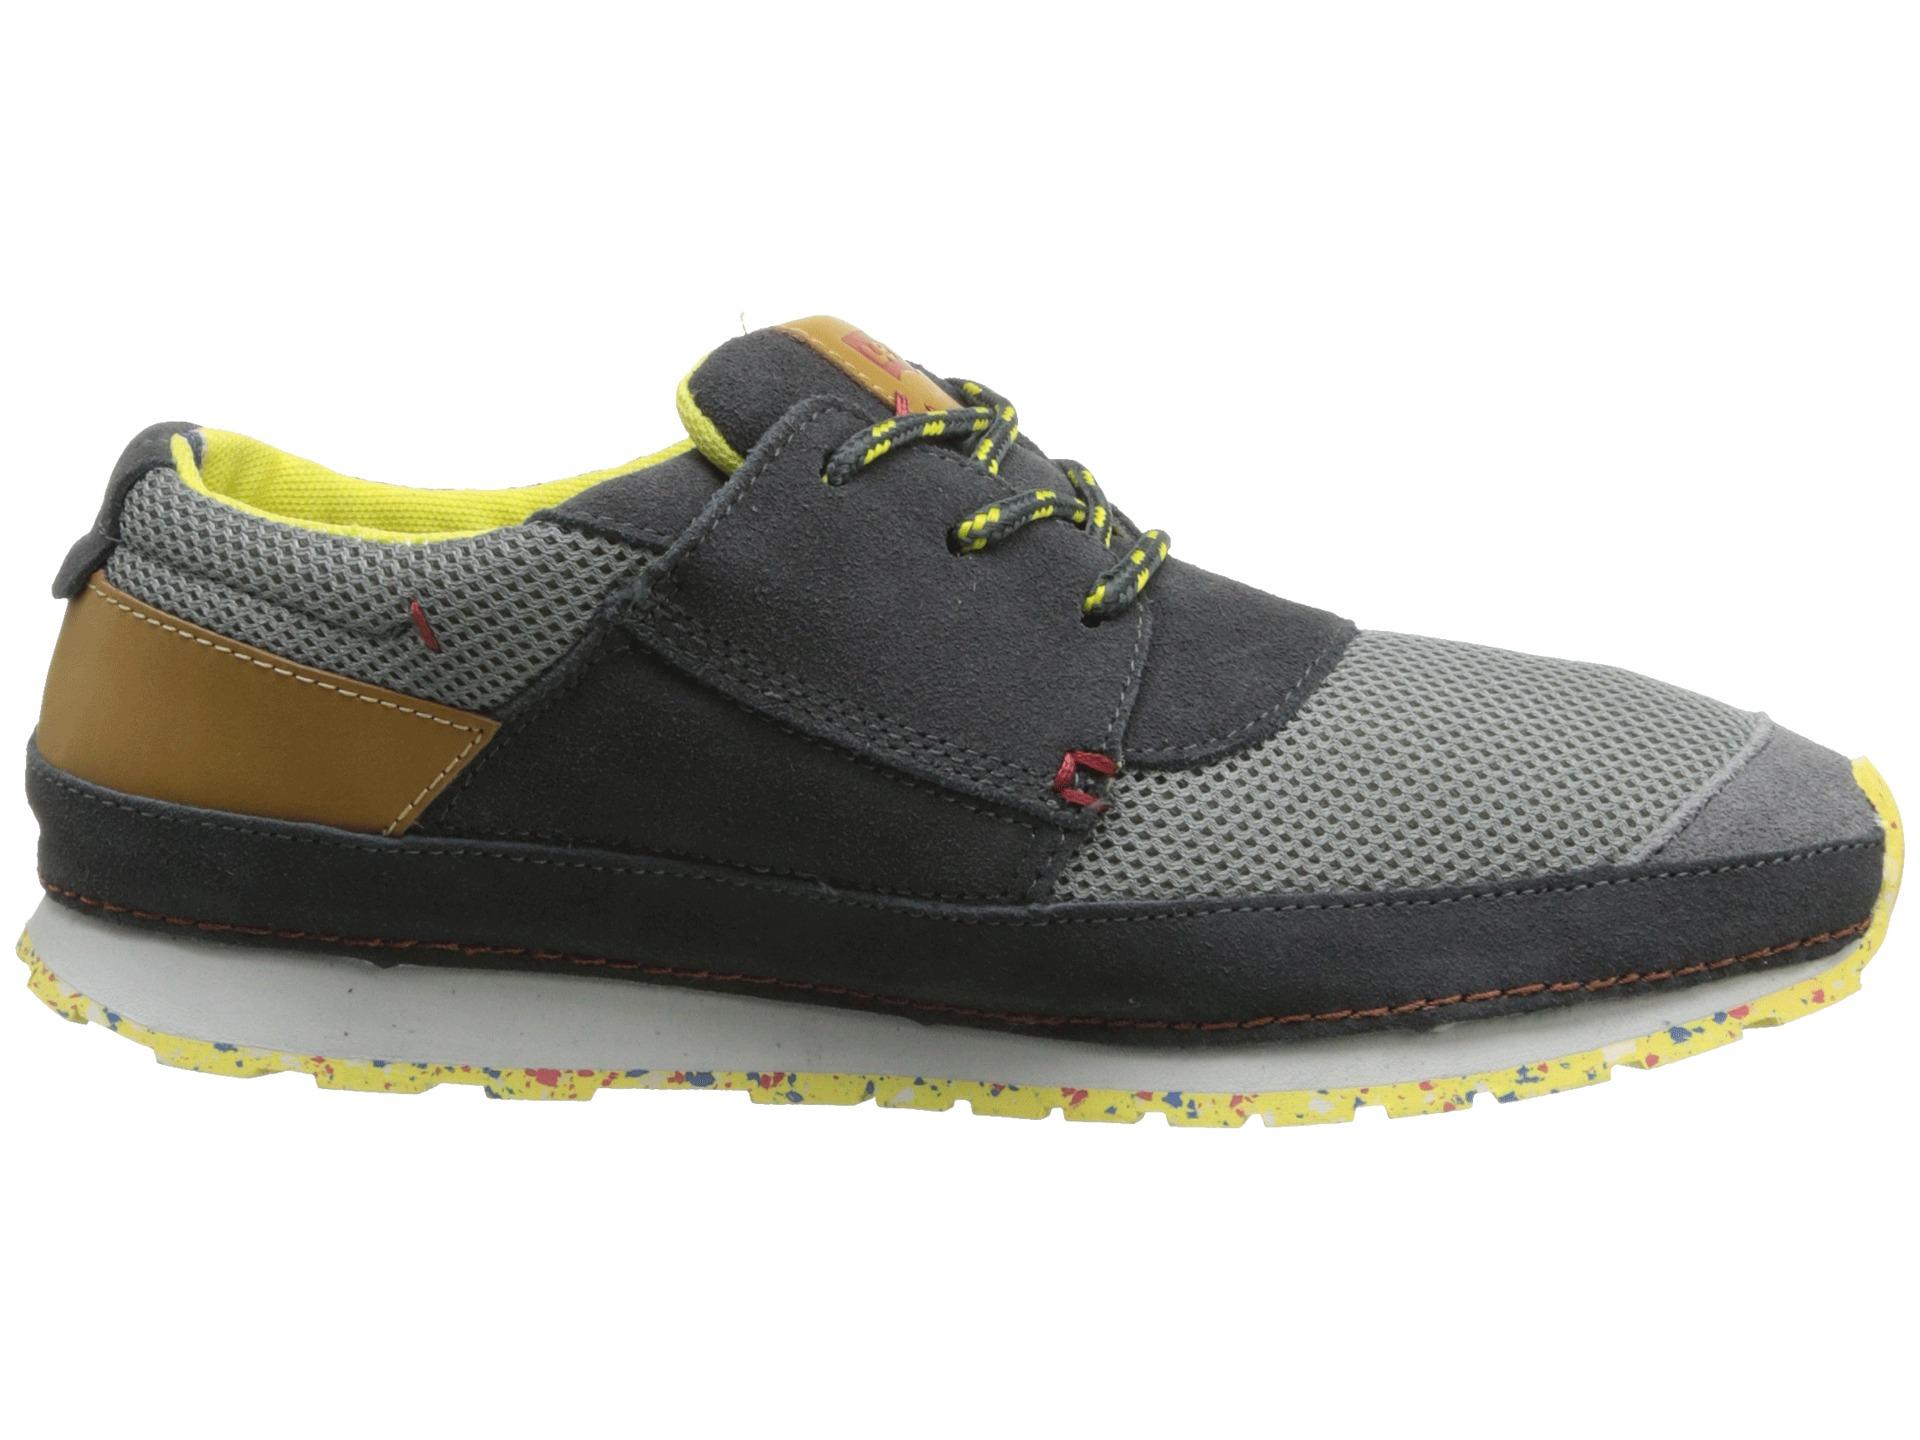 levi s shoes city runner